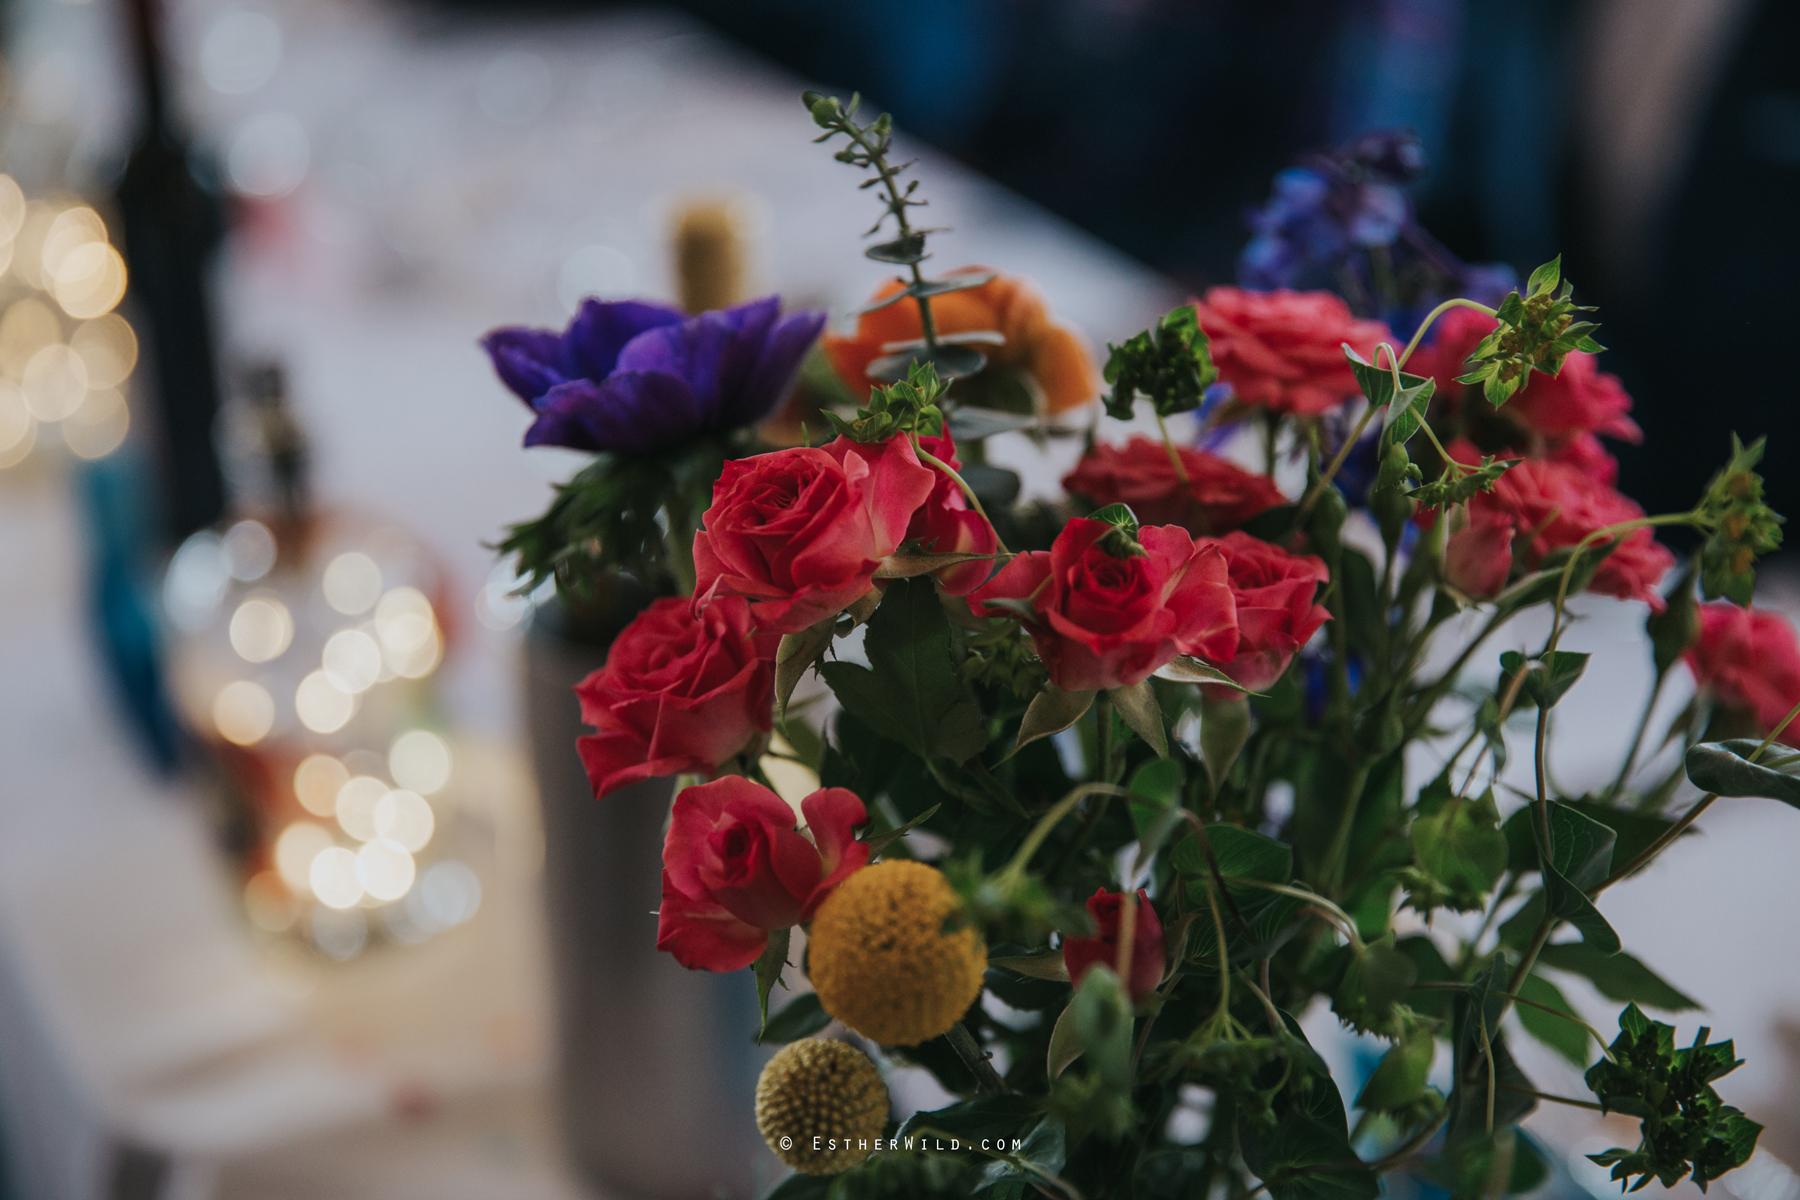 The_BoatHouse_Wedding_Venue_Ormesby_Norfolk_Broads_Boat_Wedding_Photography_Esther_Wild_Photographer_IMG_2169.jpg